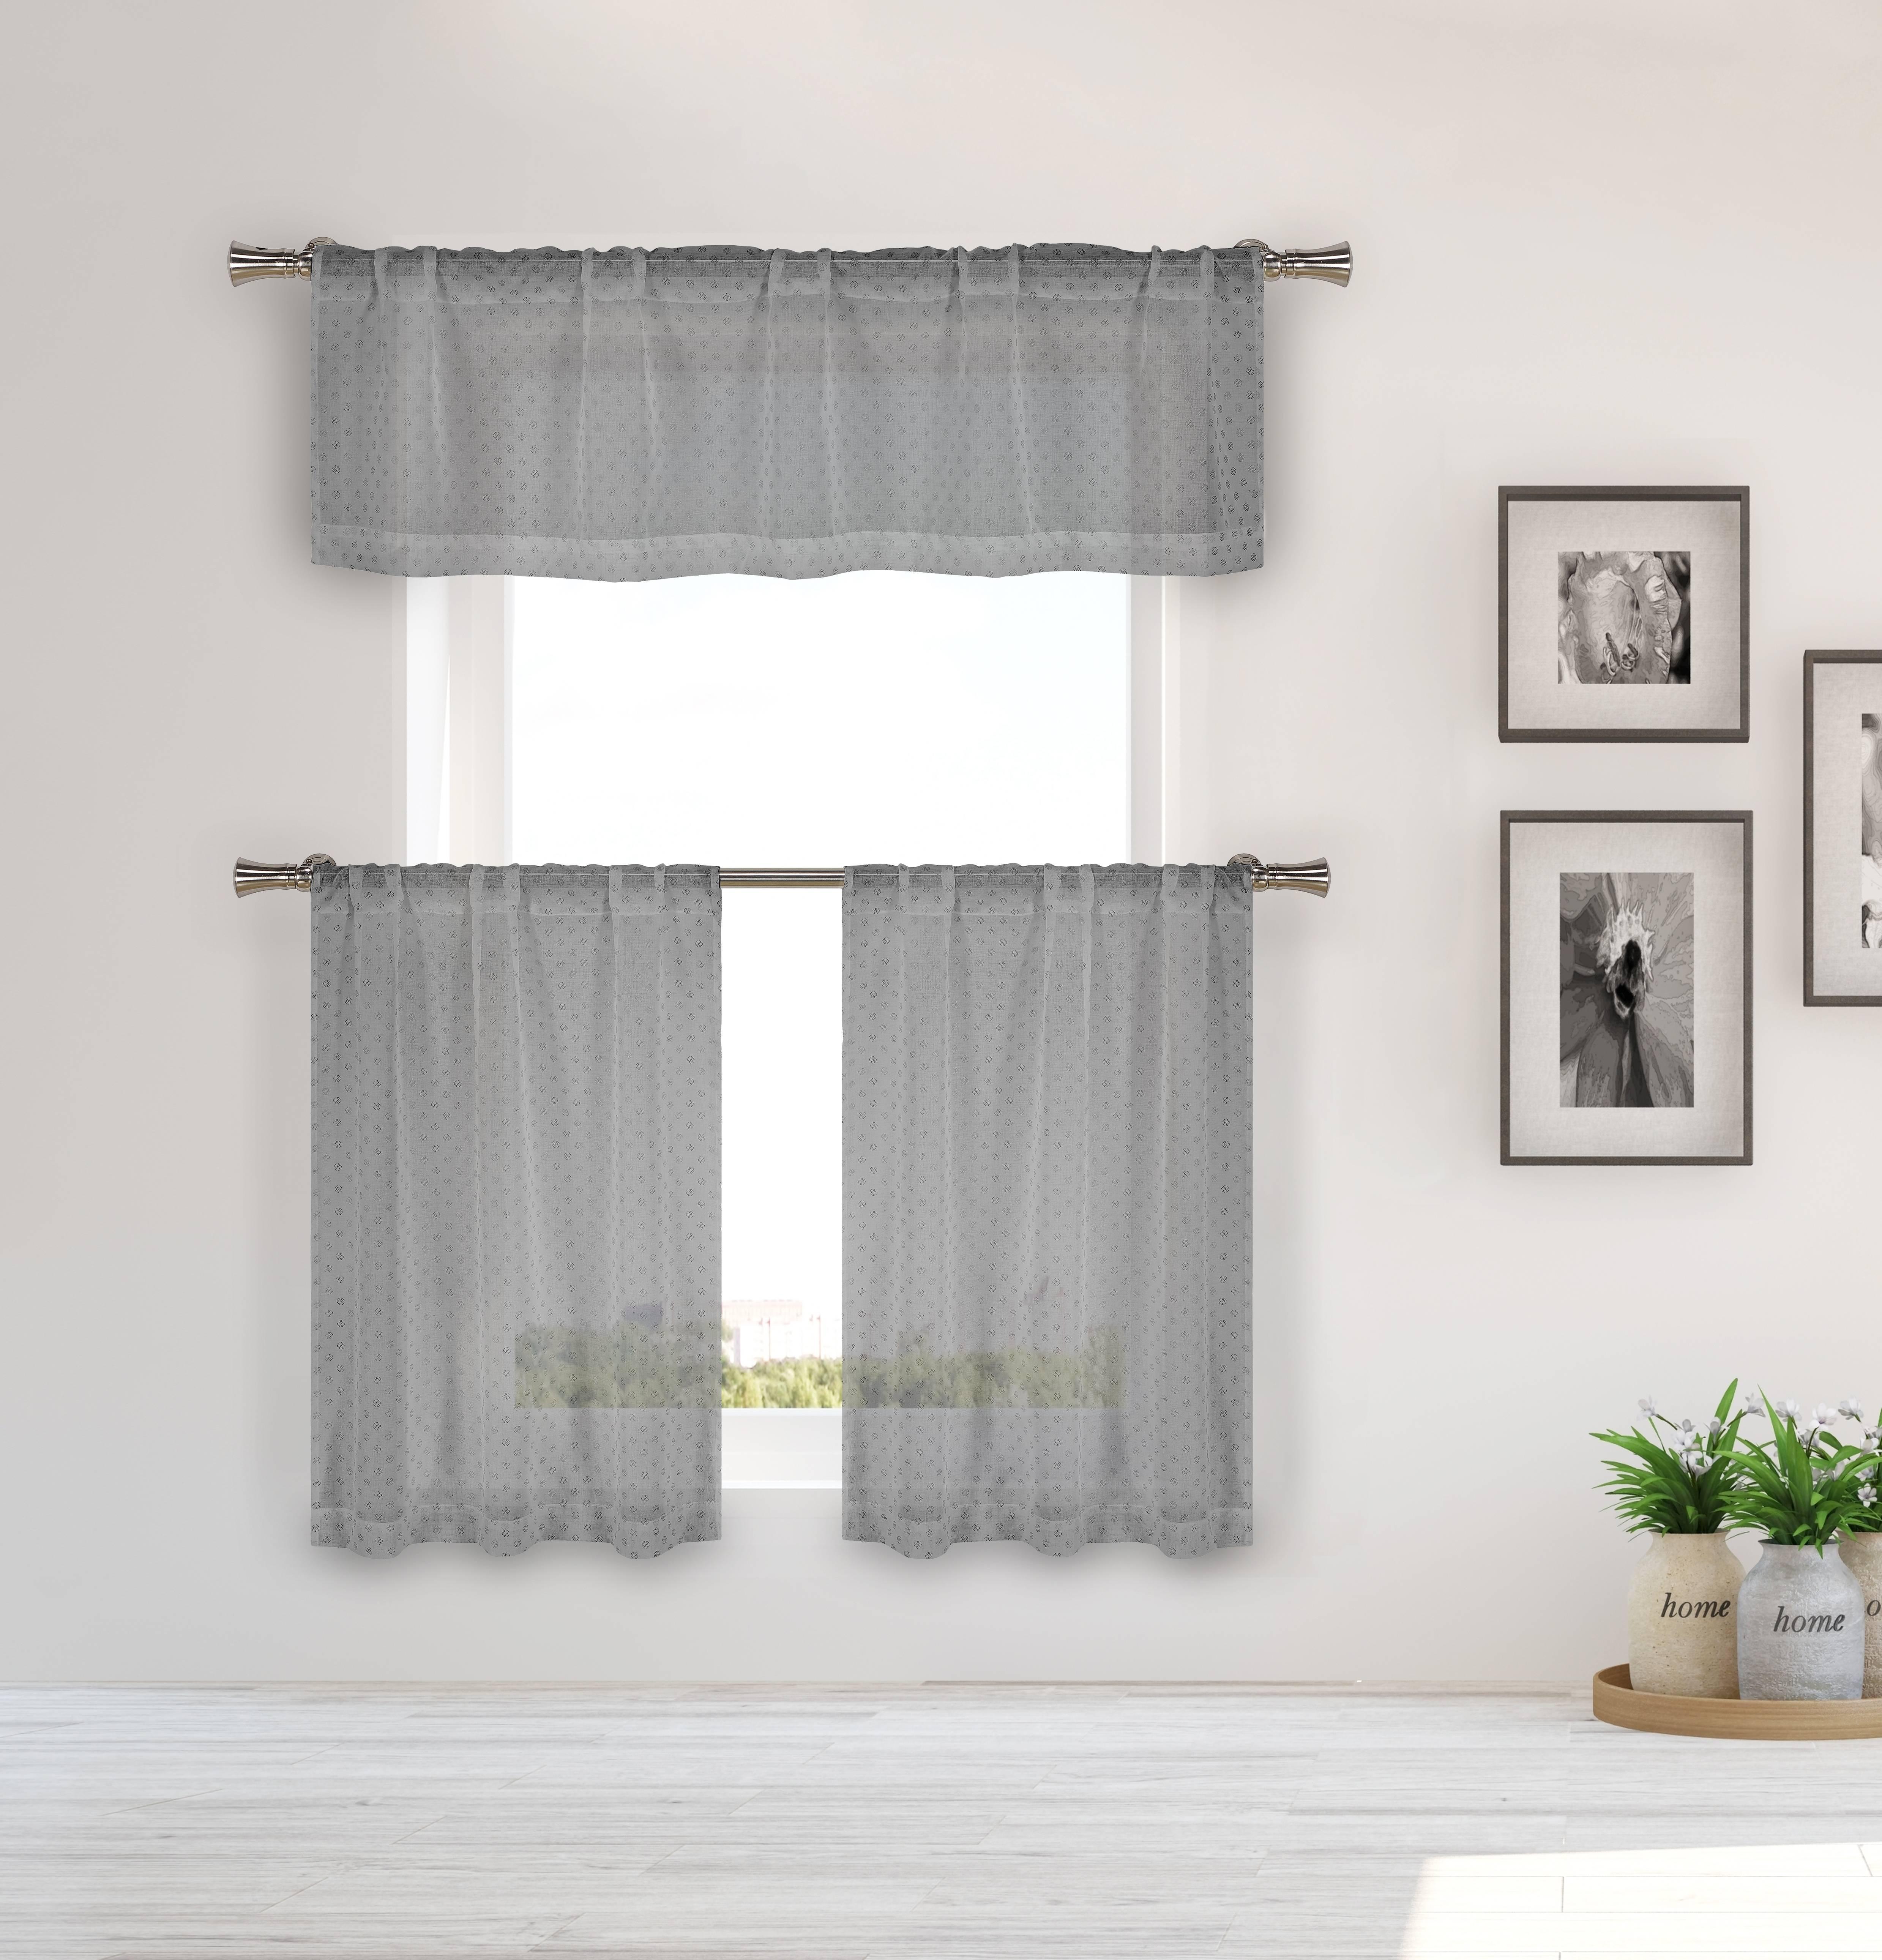 Elara 3 Piece Kitchen Curtain Set 56 in. W x 15 in. L in Silver